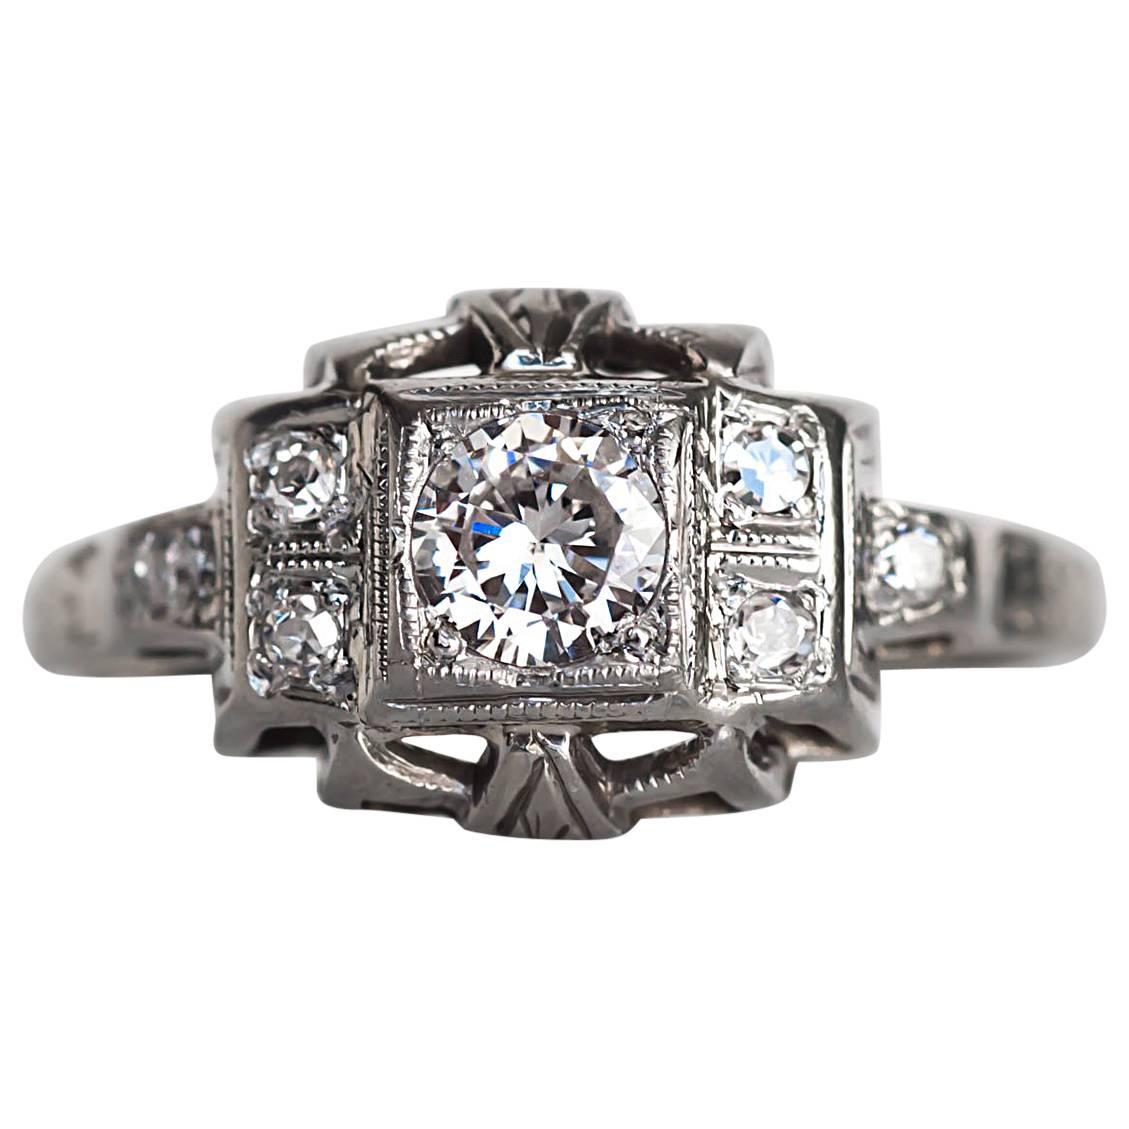 1930s Art Deco White Gold .24 Carat Diamond Engagement Ring